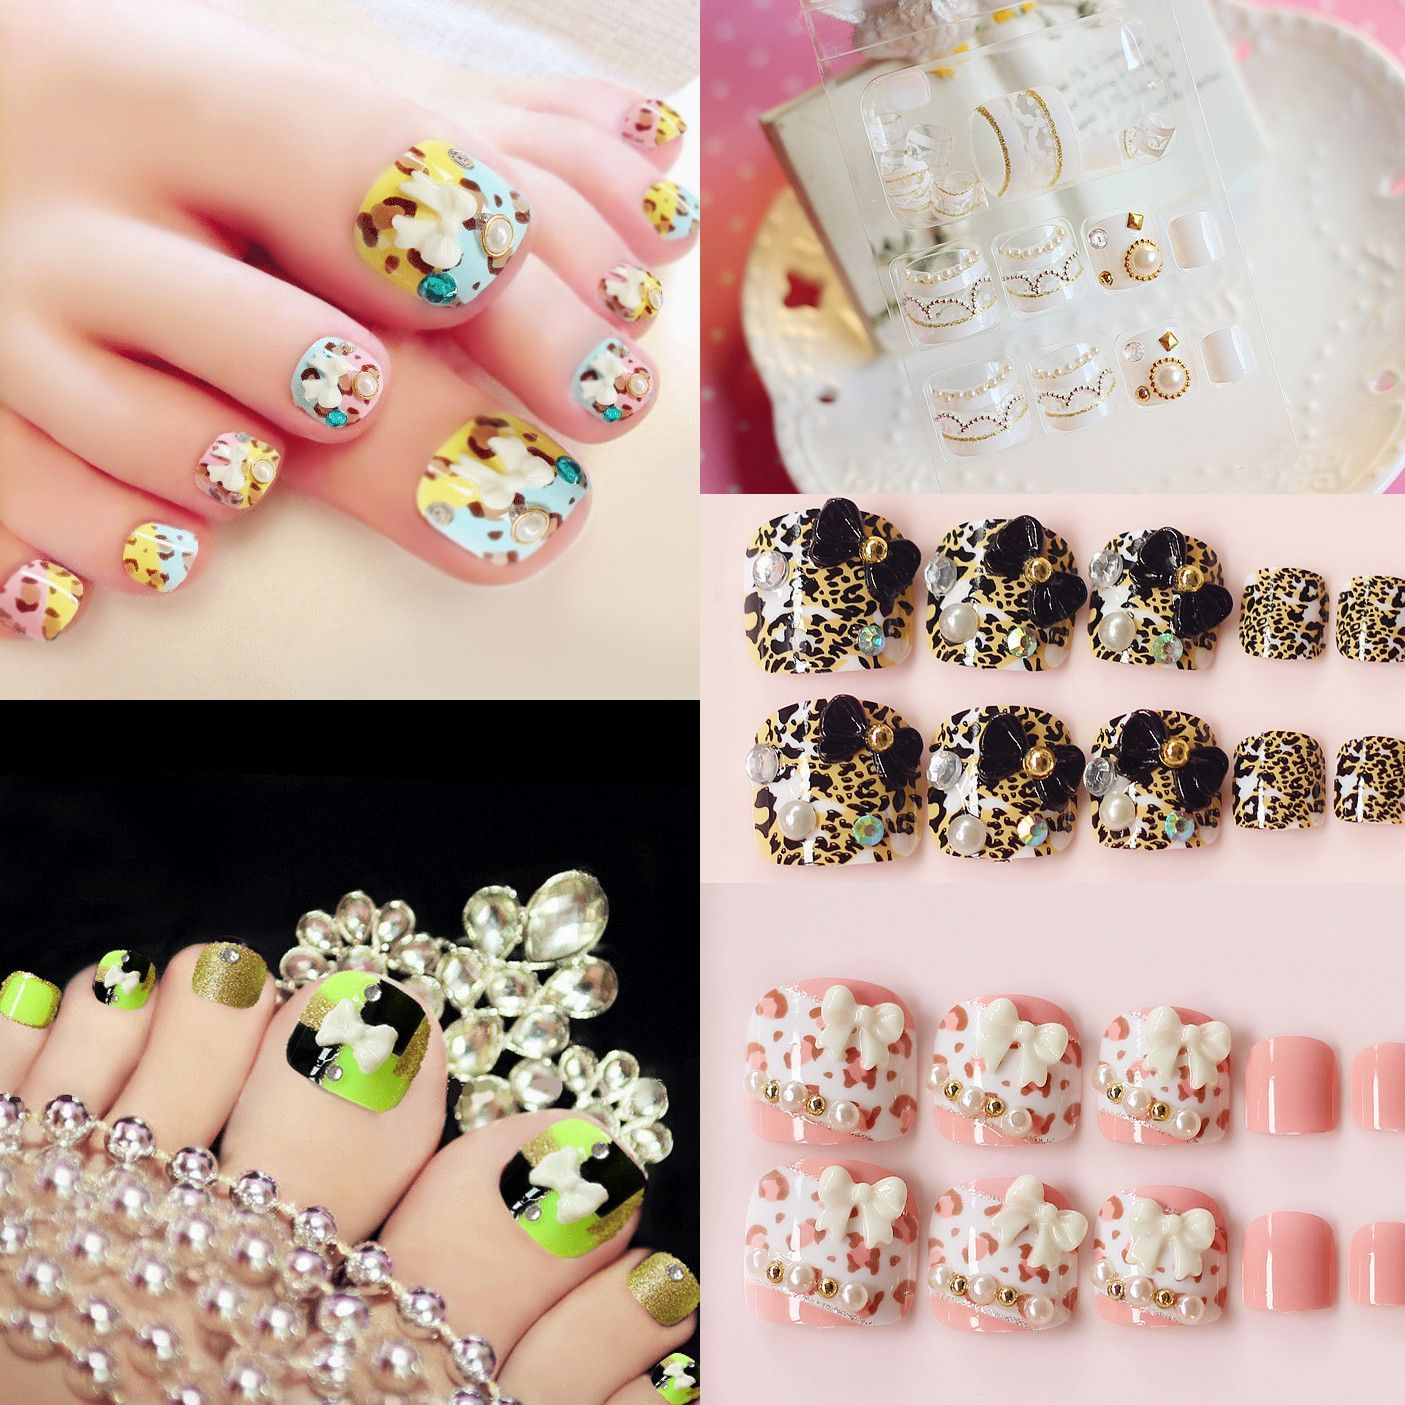 False Fake Toe Nails Pink Lace Fake Nails Toes Flower Pearl Diamond ...